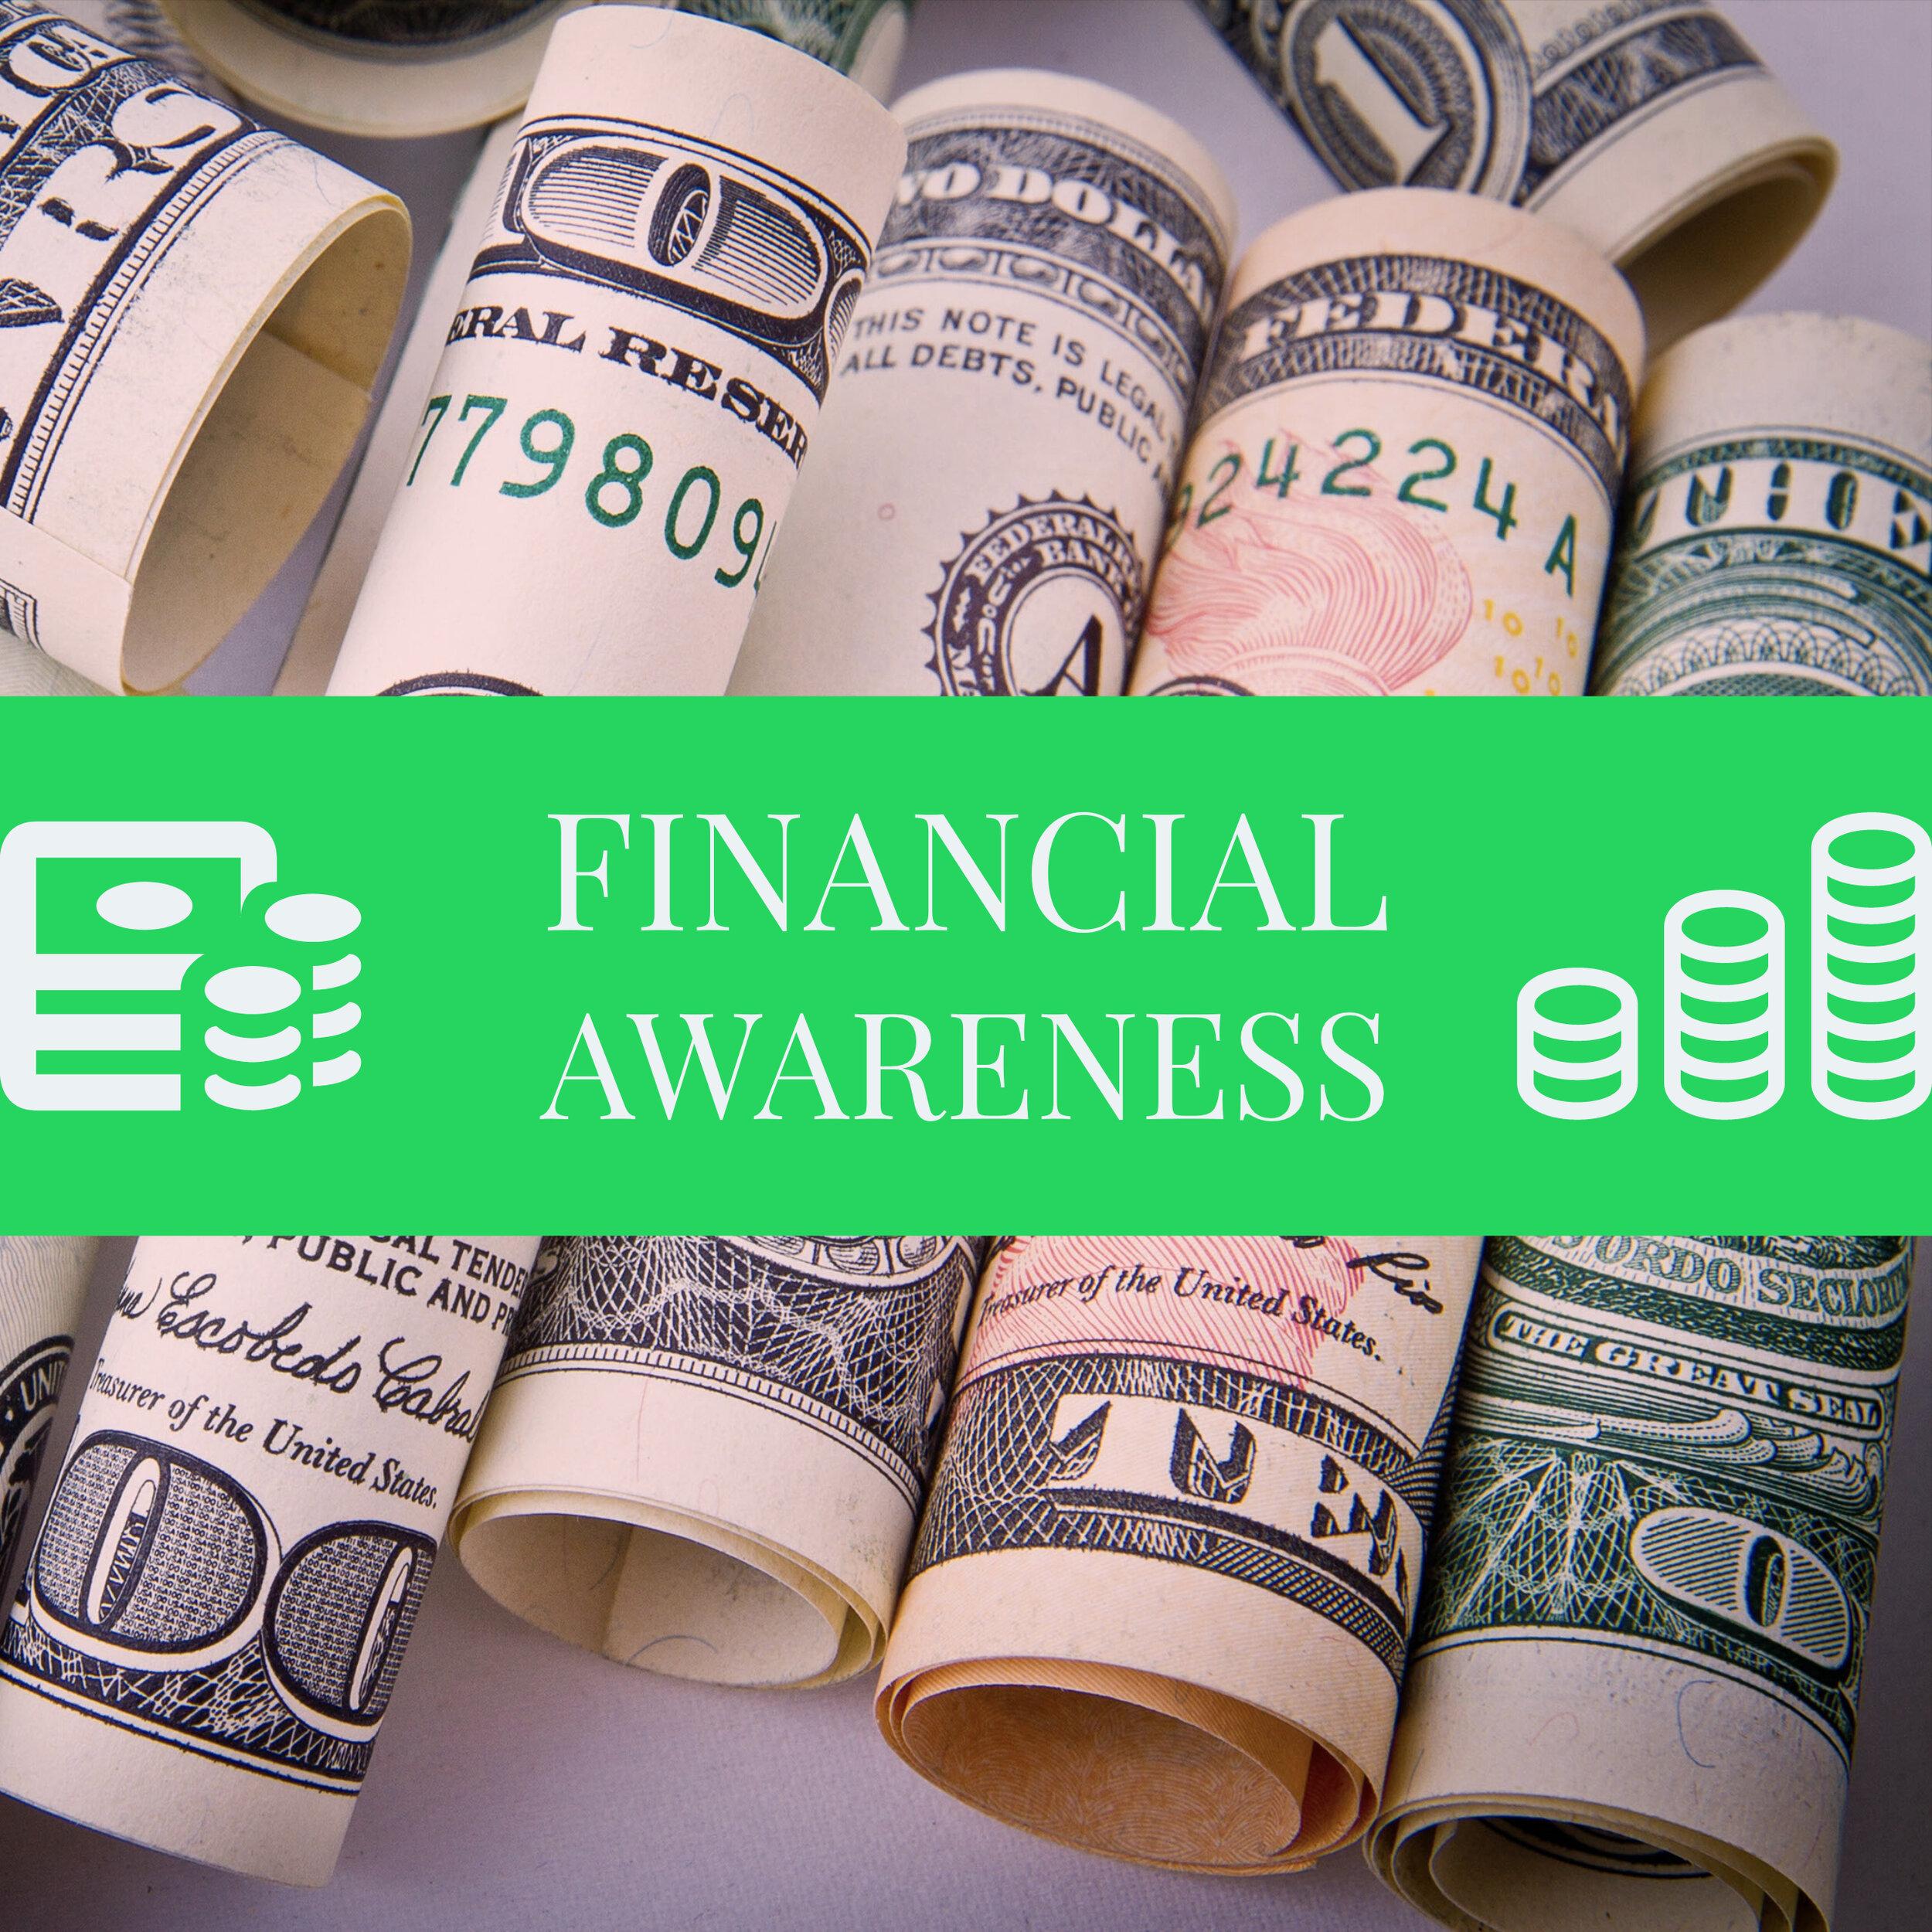 FinancialAwareness.jpg